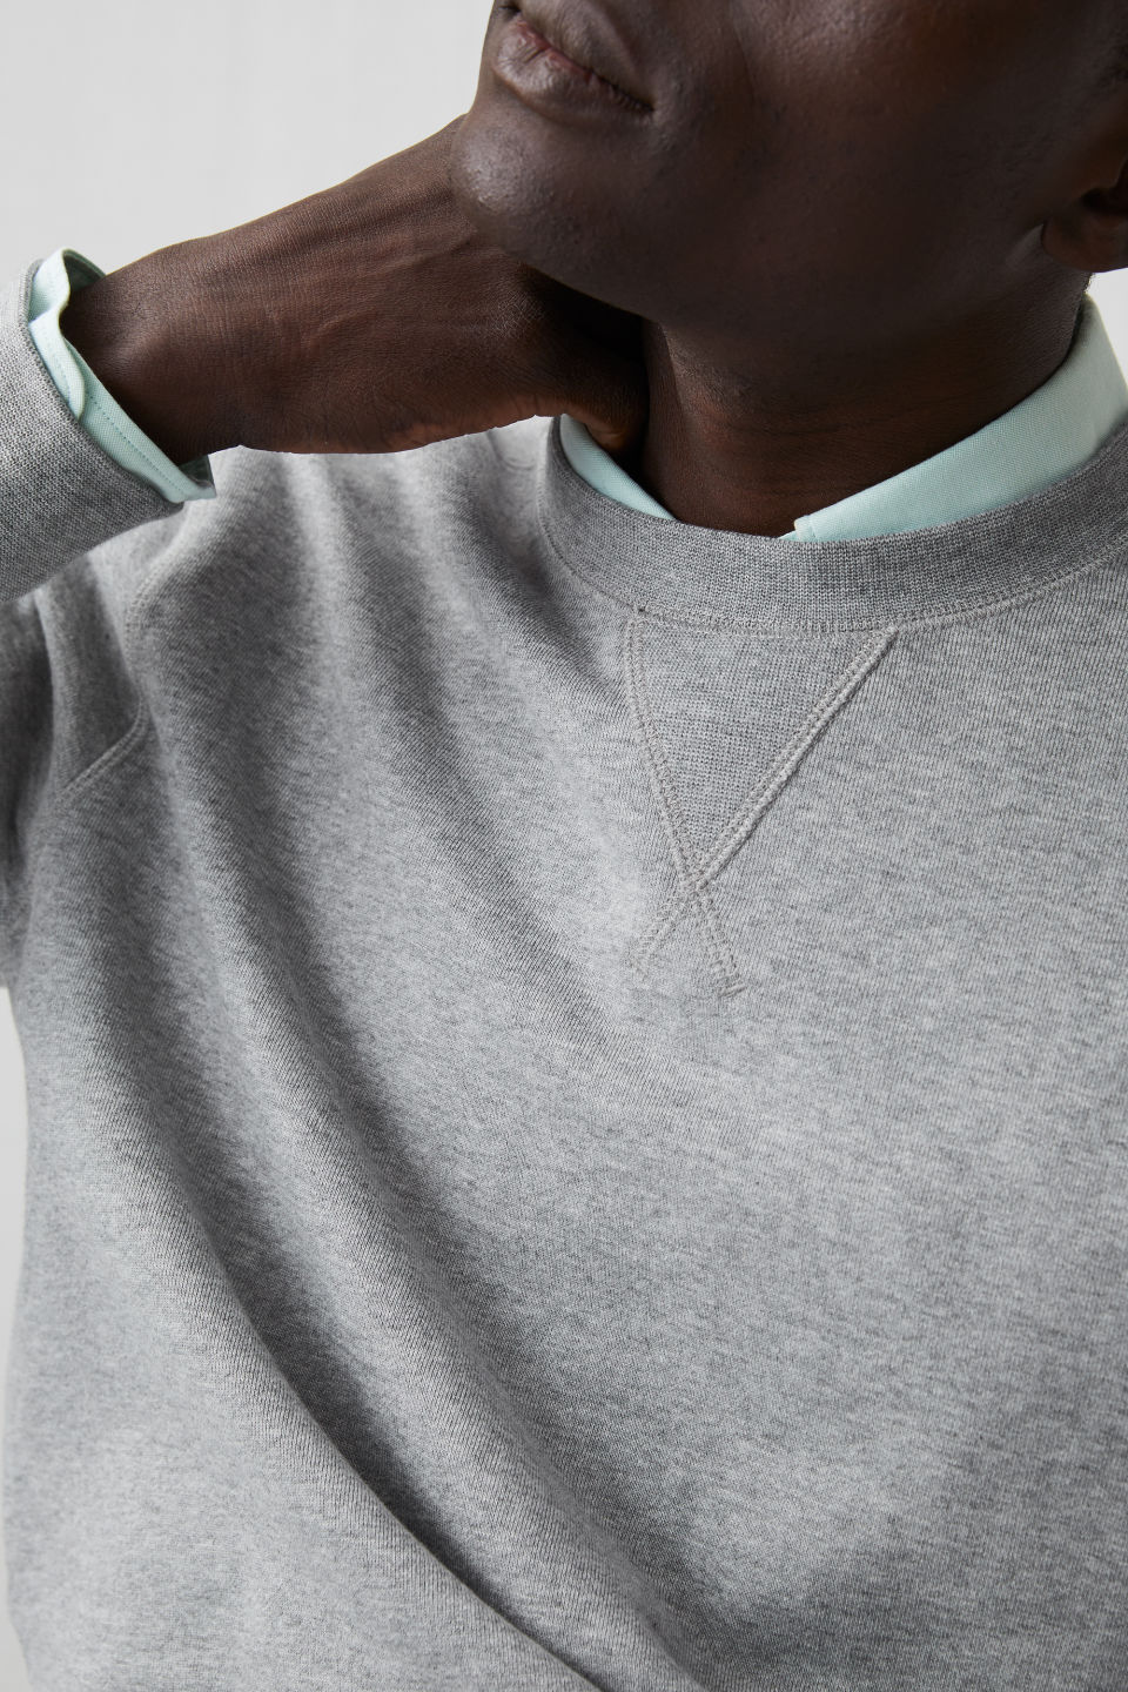 7f61c8bec French Terry Sweatshirt - Grey Melange - Sweatshirts   Hoodies - ARKET